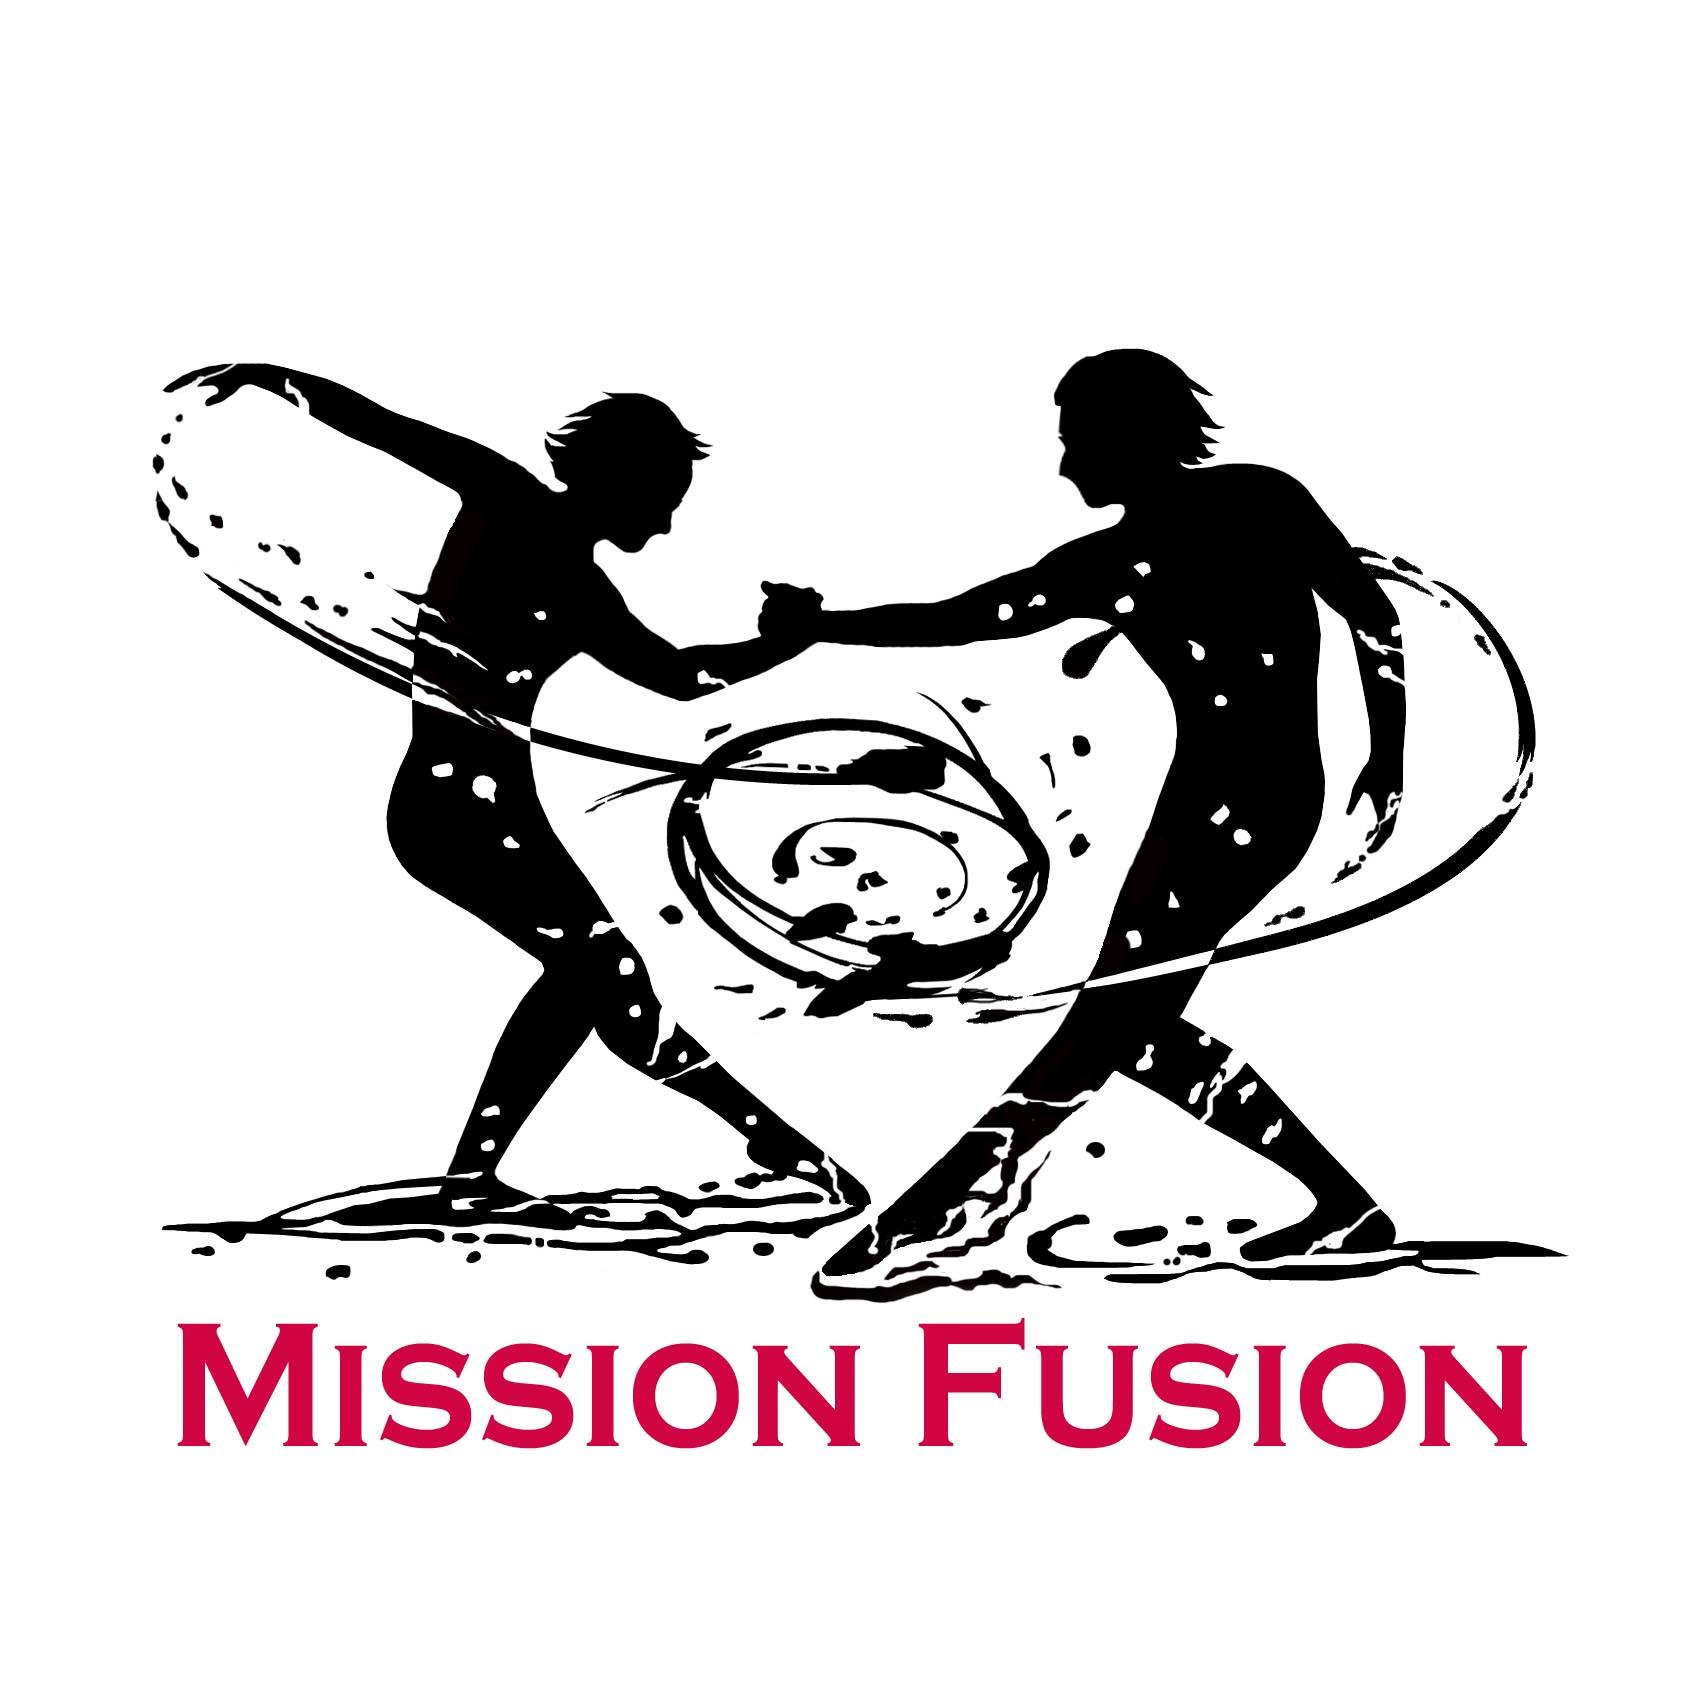 Mission Fusion Workshop & Practice